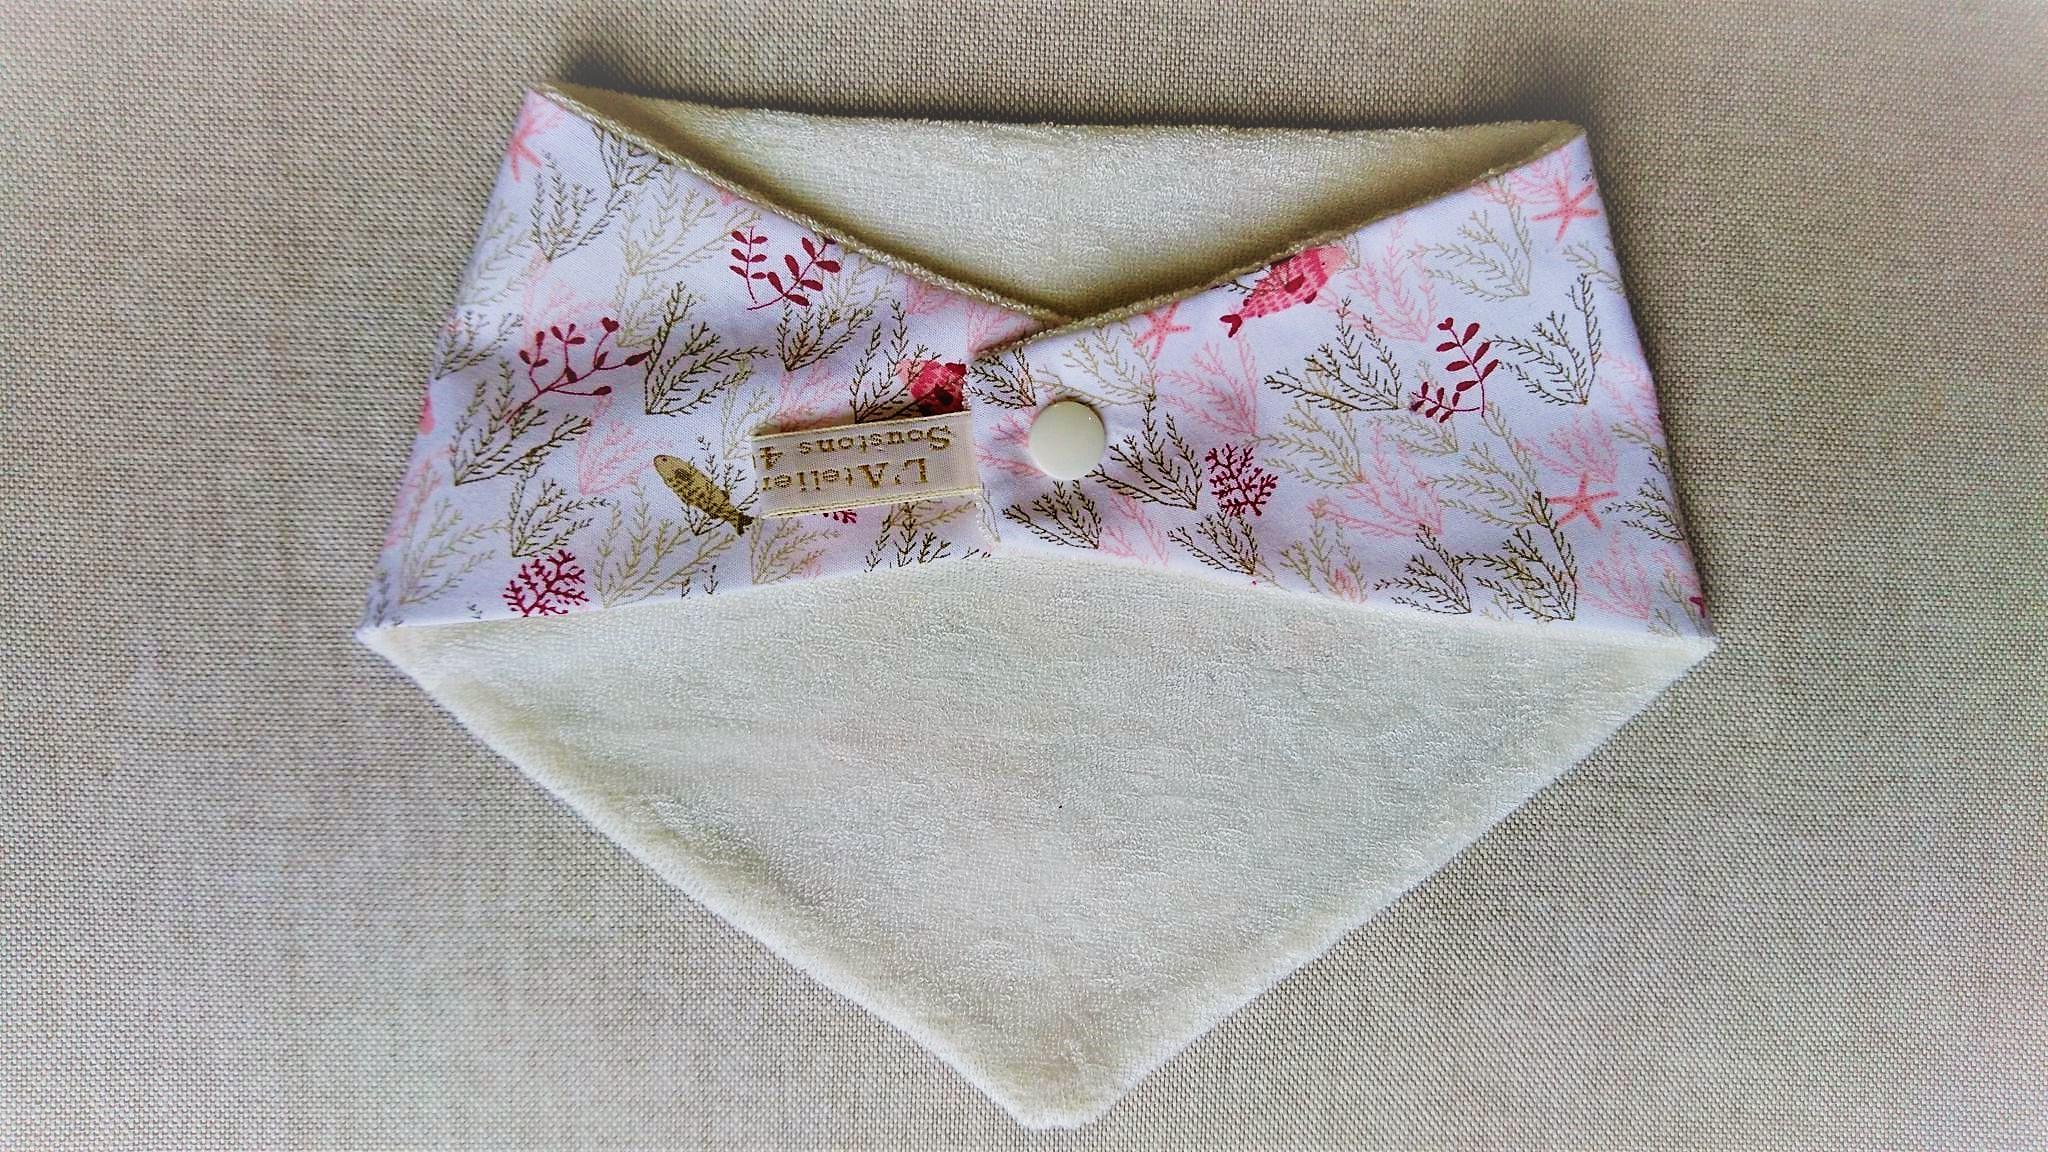 Bavoir bandana en coton et micro-éponge bambou certifiés oeko-tex, corail